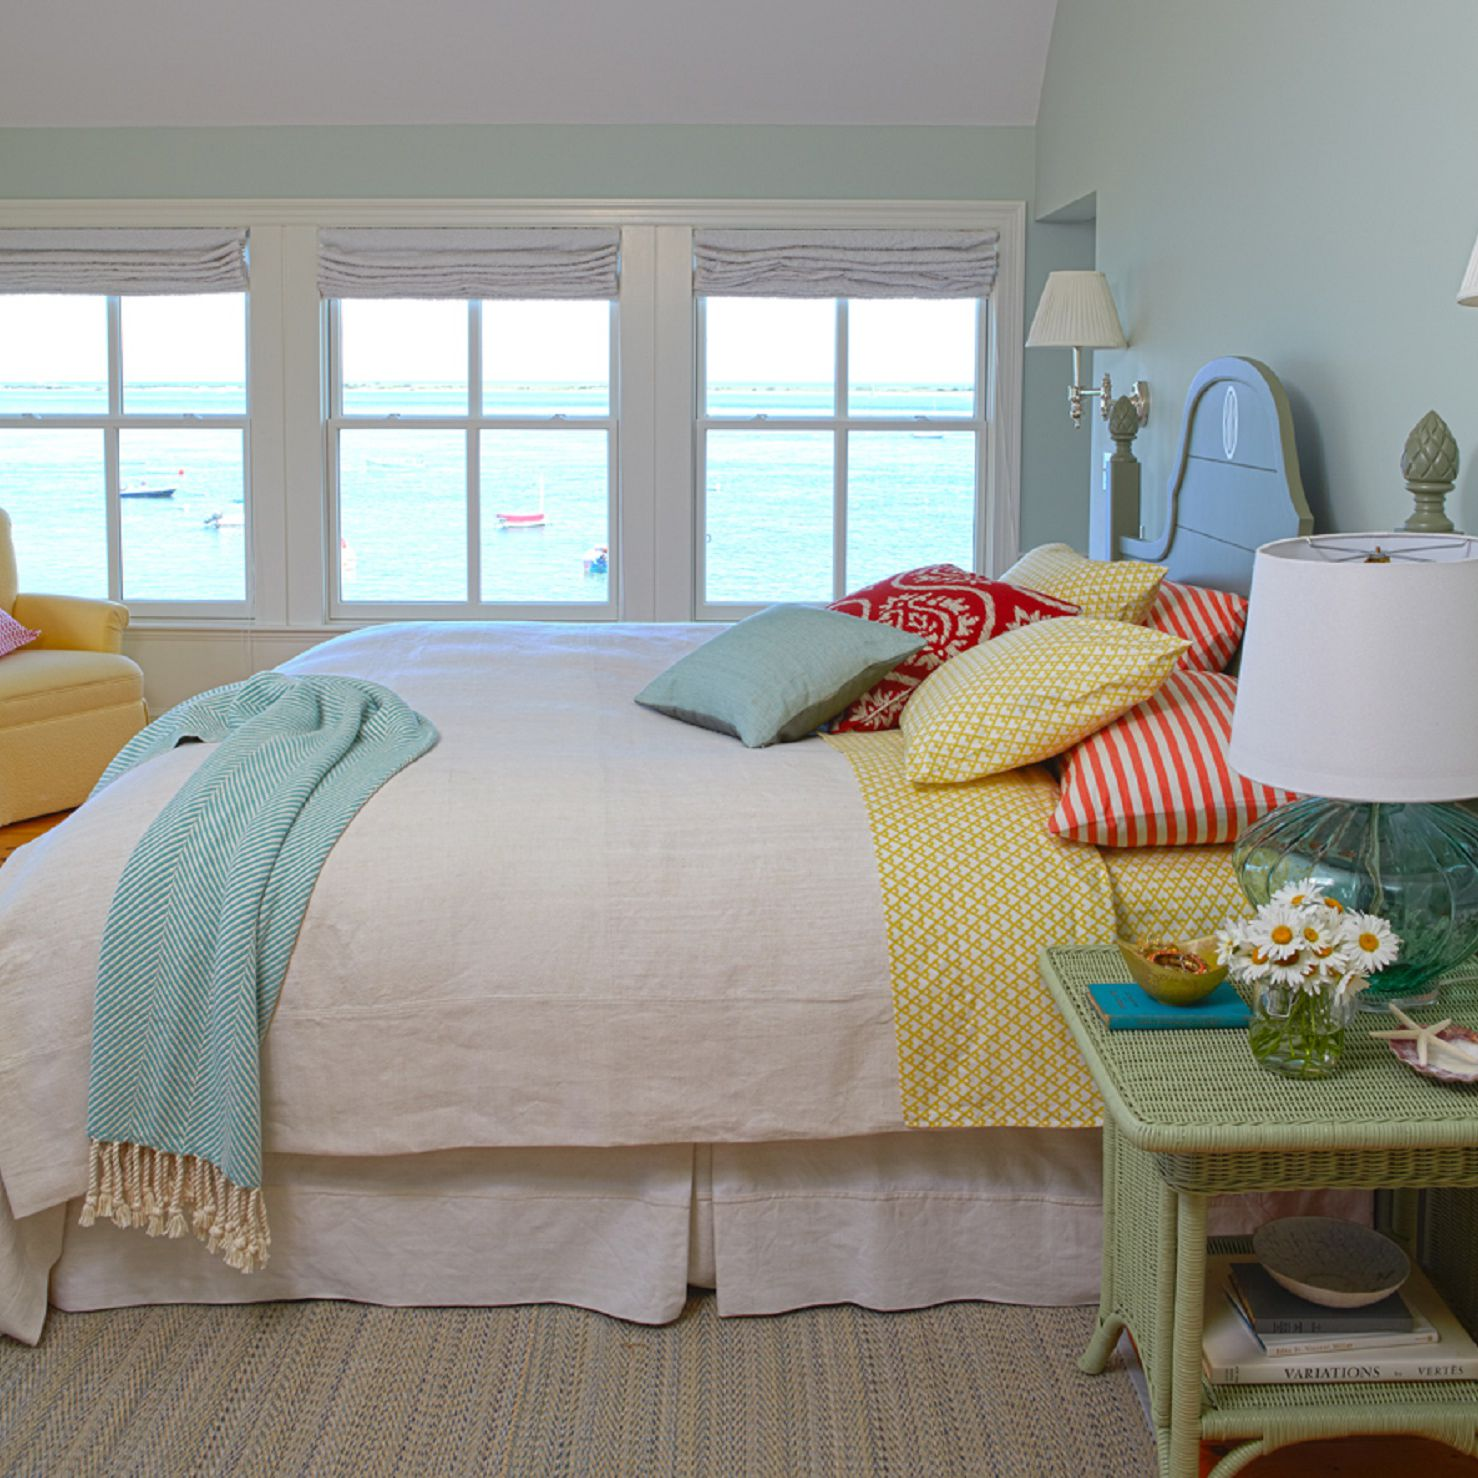 complementary color scheme in interior design trends